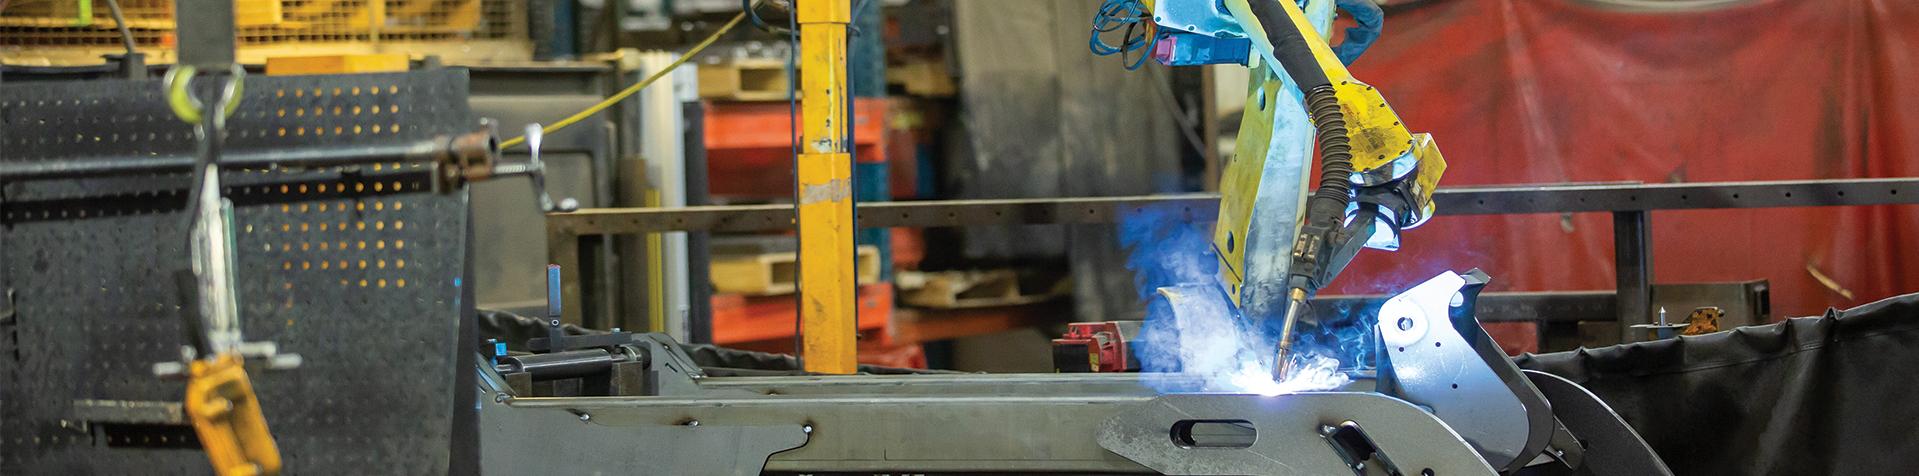 A welding robot welding a piece of metal at a Steffes manufacturing plant